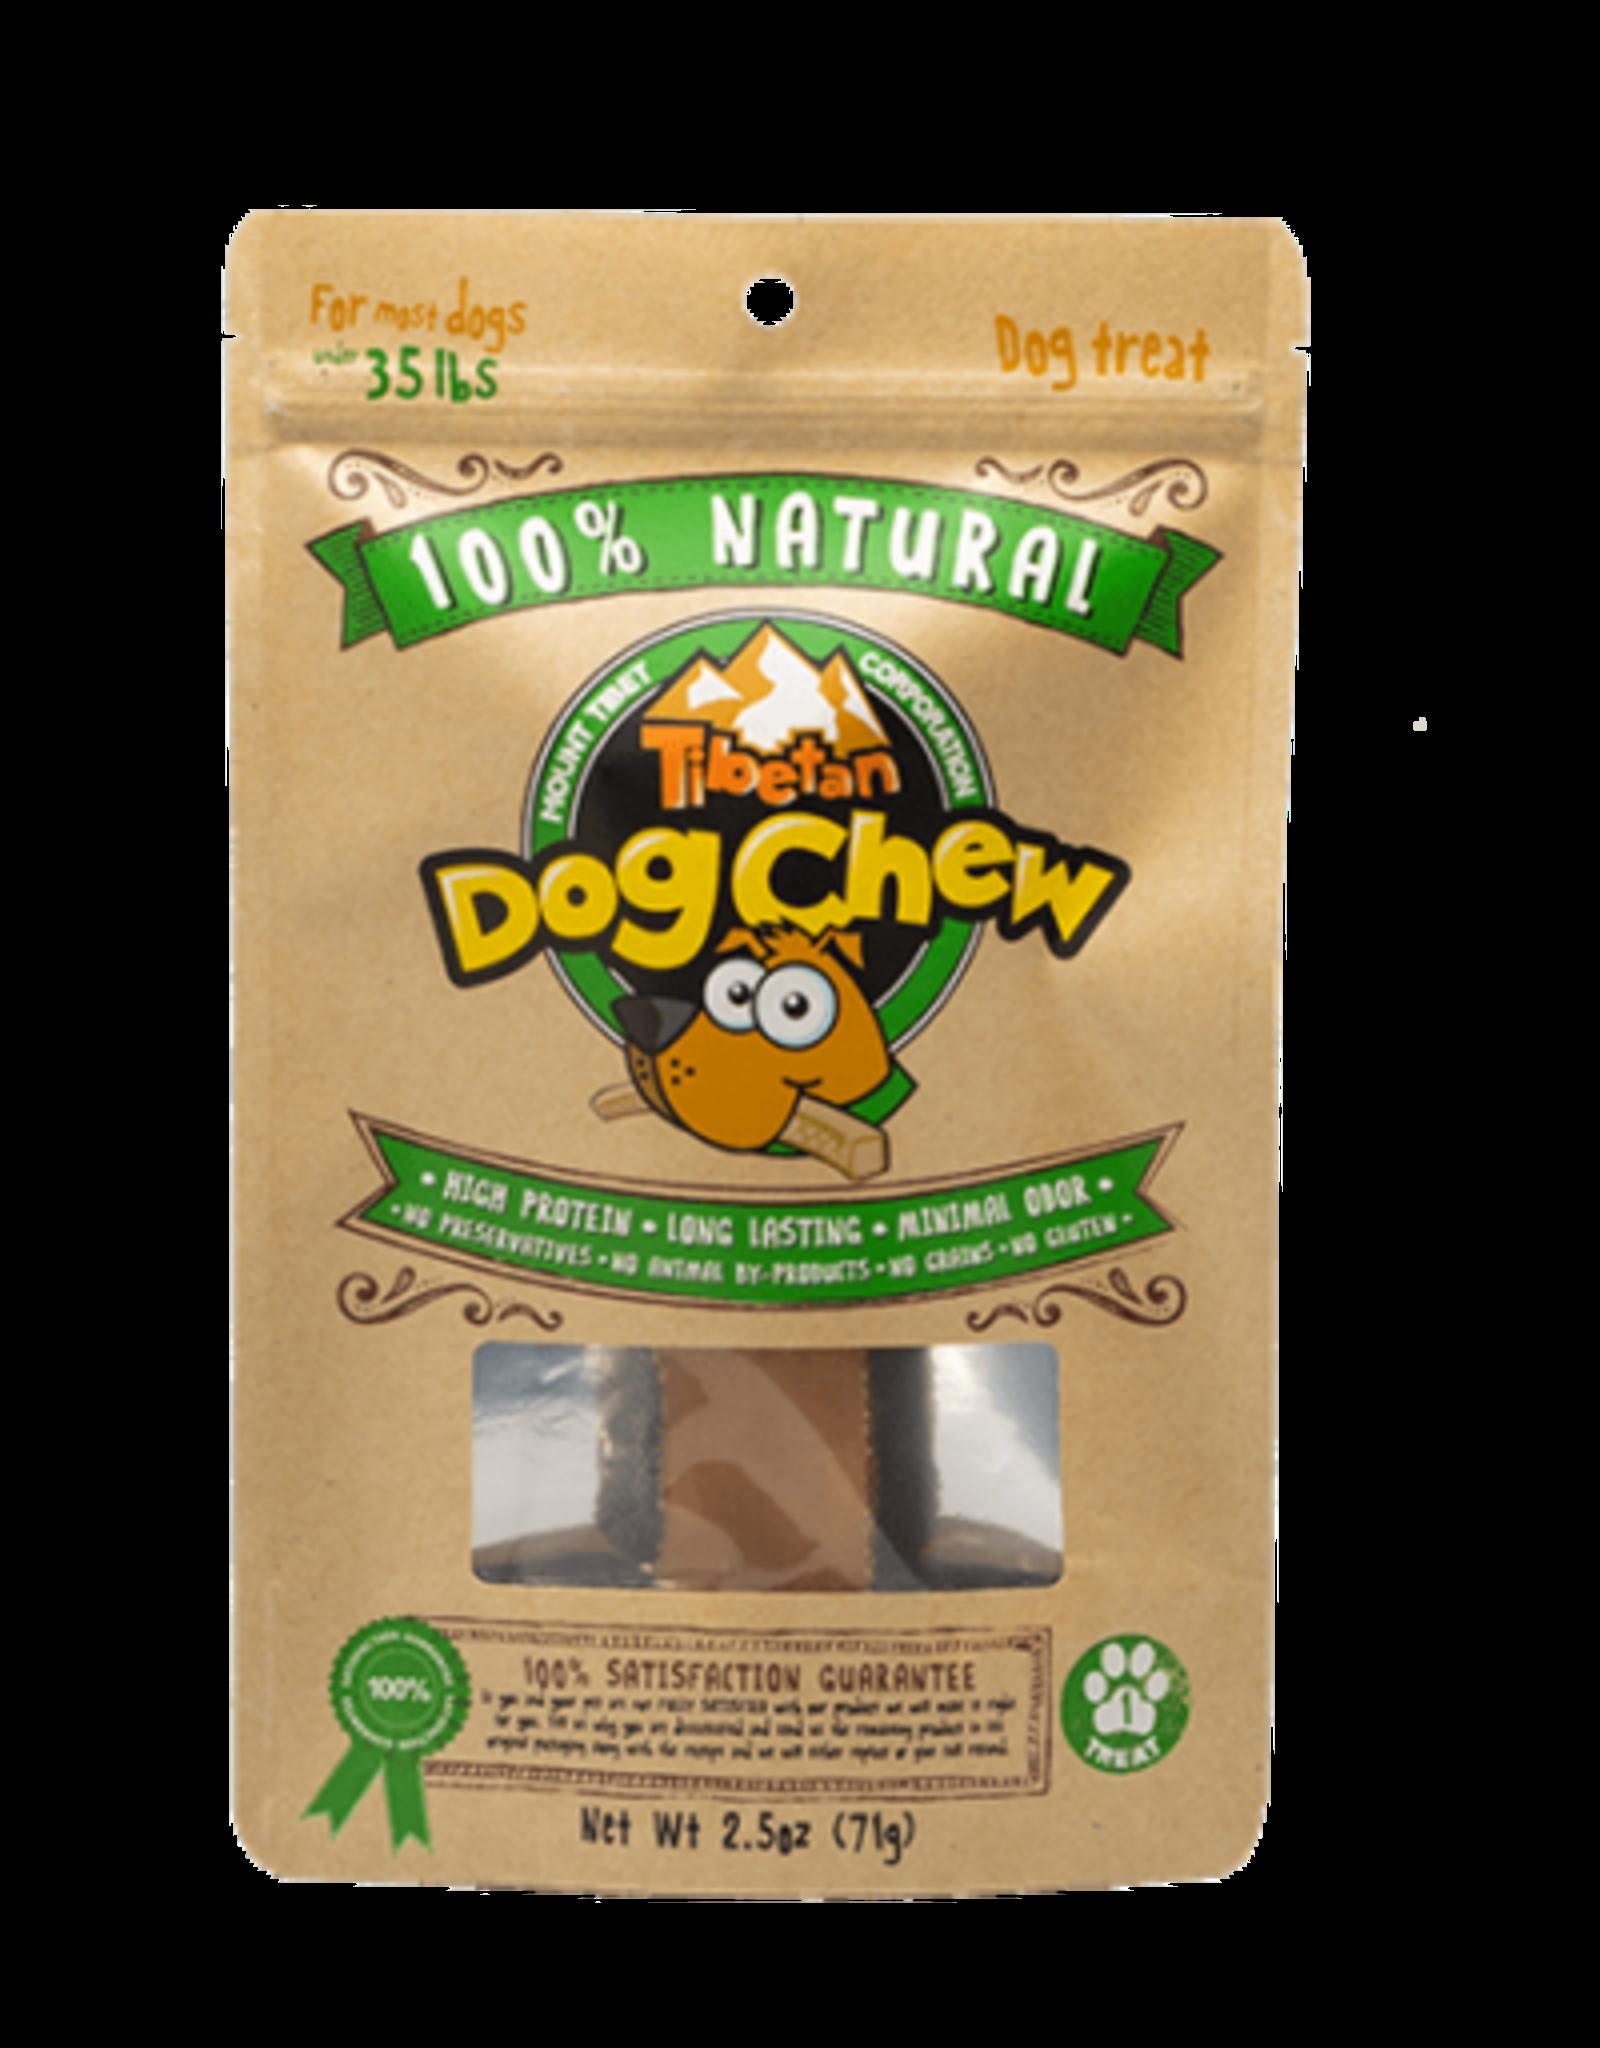 100% Natural 100% Natural Tibetan Dog Chew M